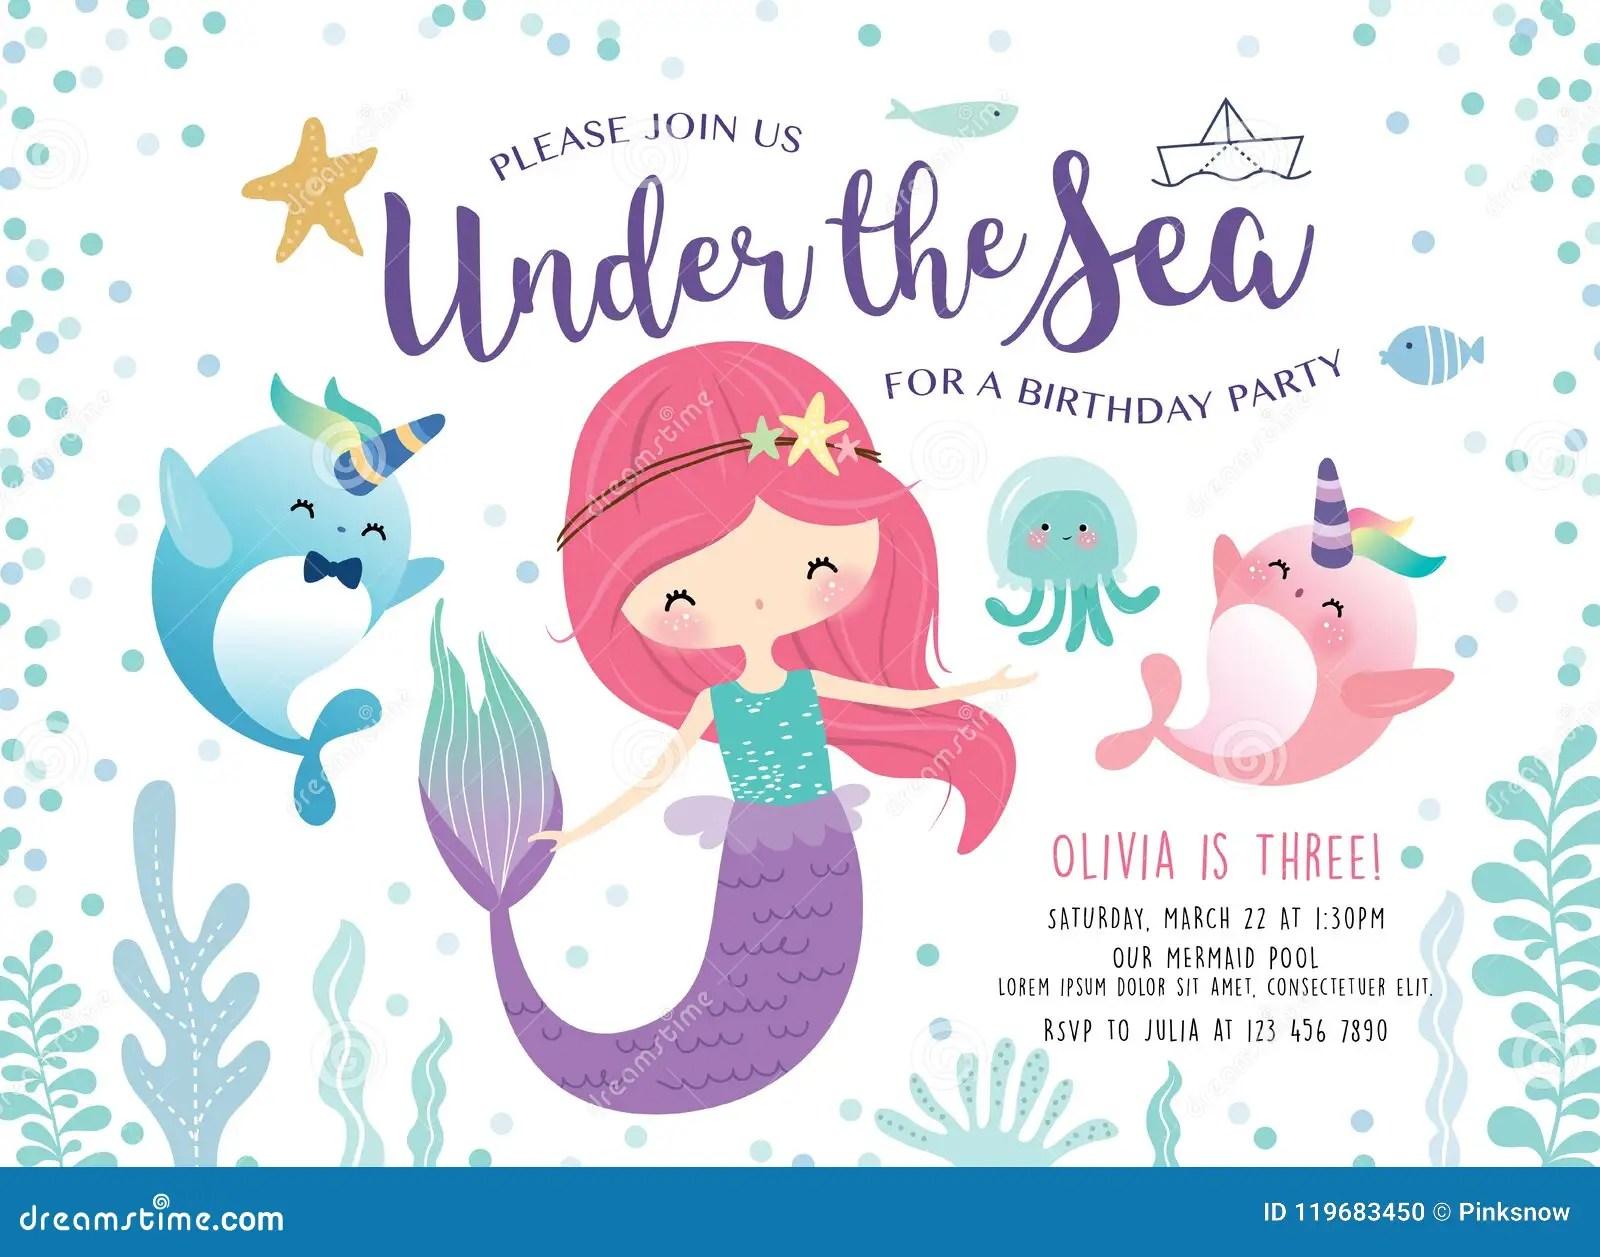 https www dreamstime com kids birthday party invitation card cute little mermaid marine life kids under sea birthday party invitation card image119683450